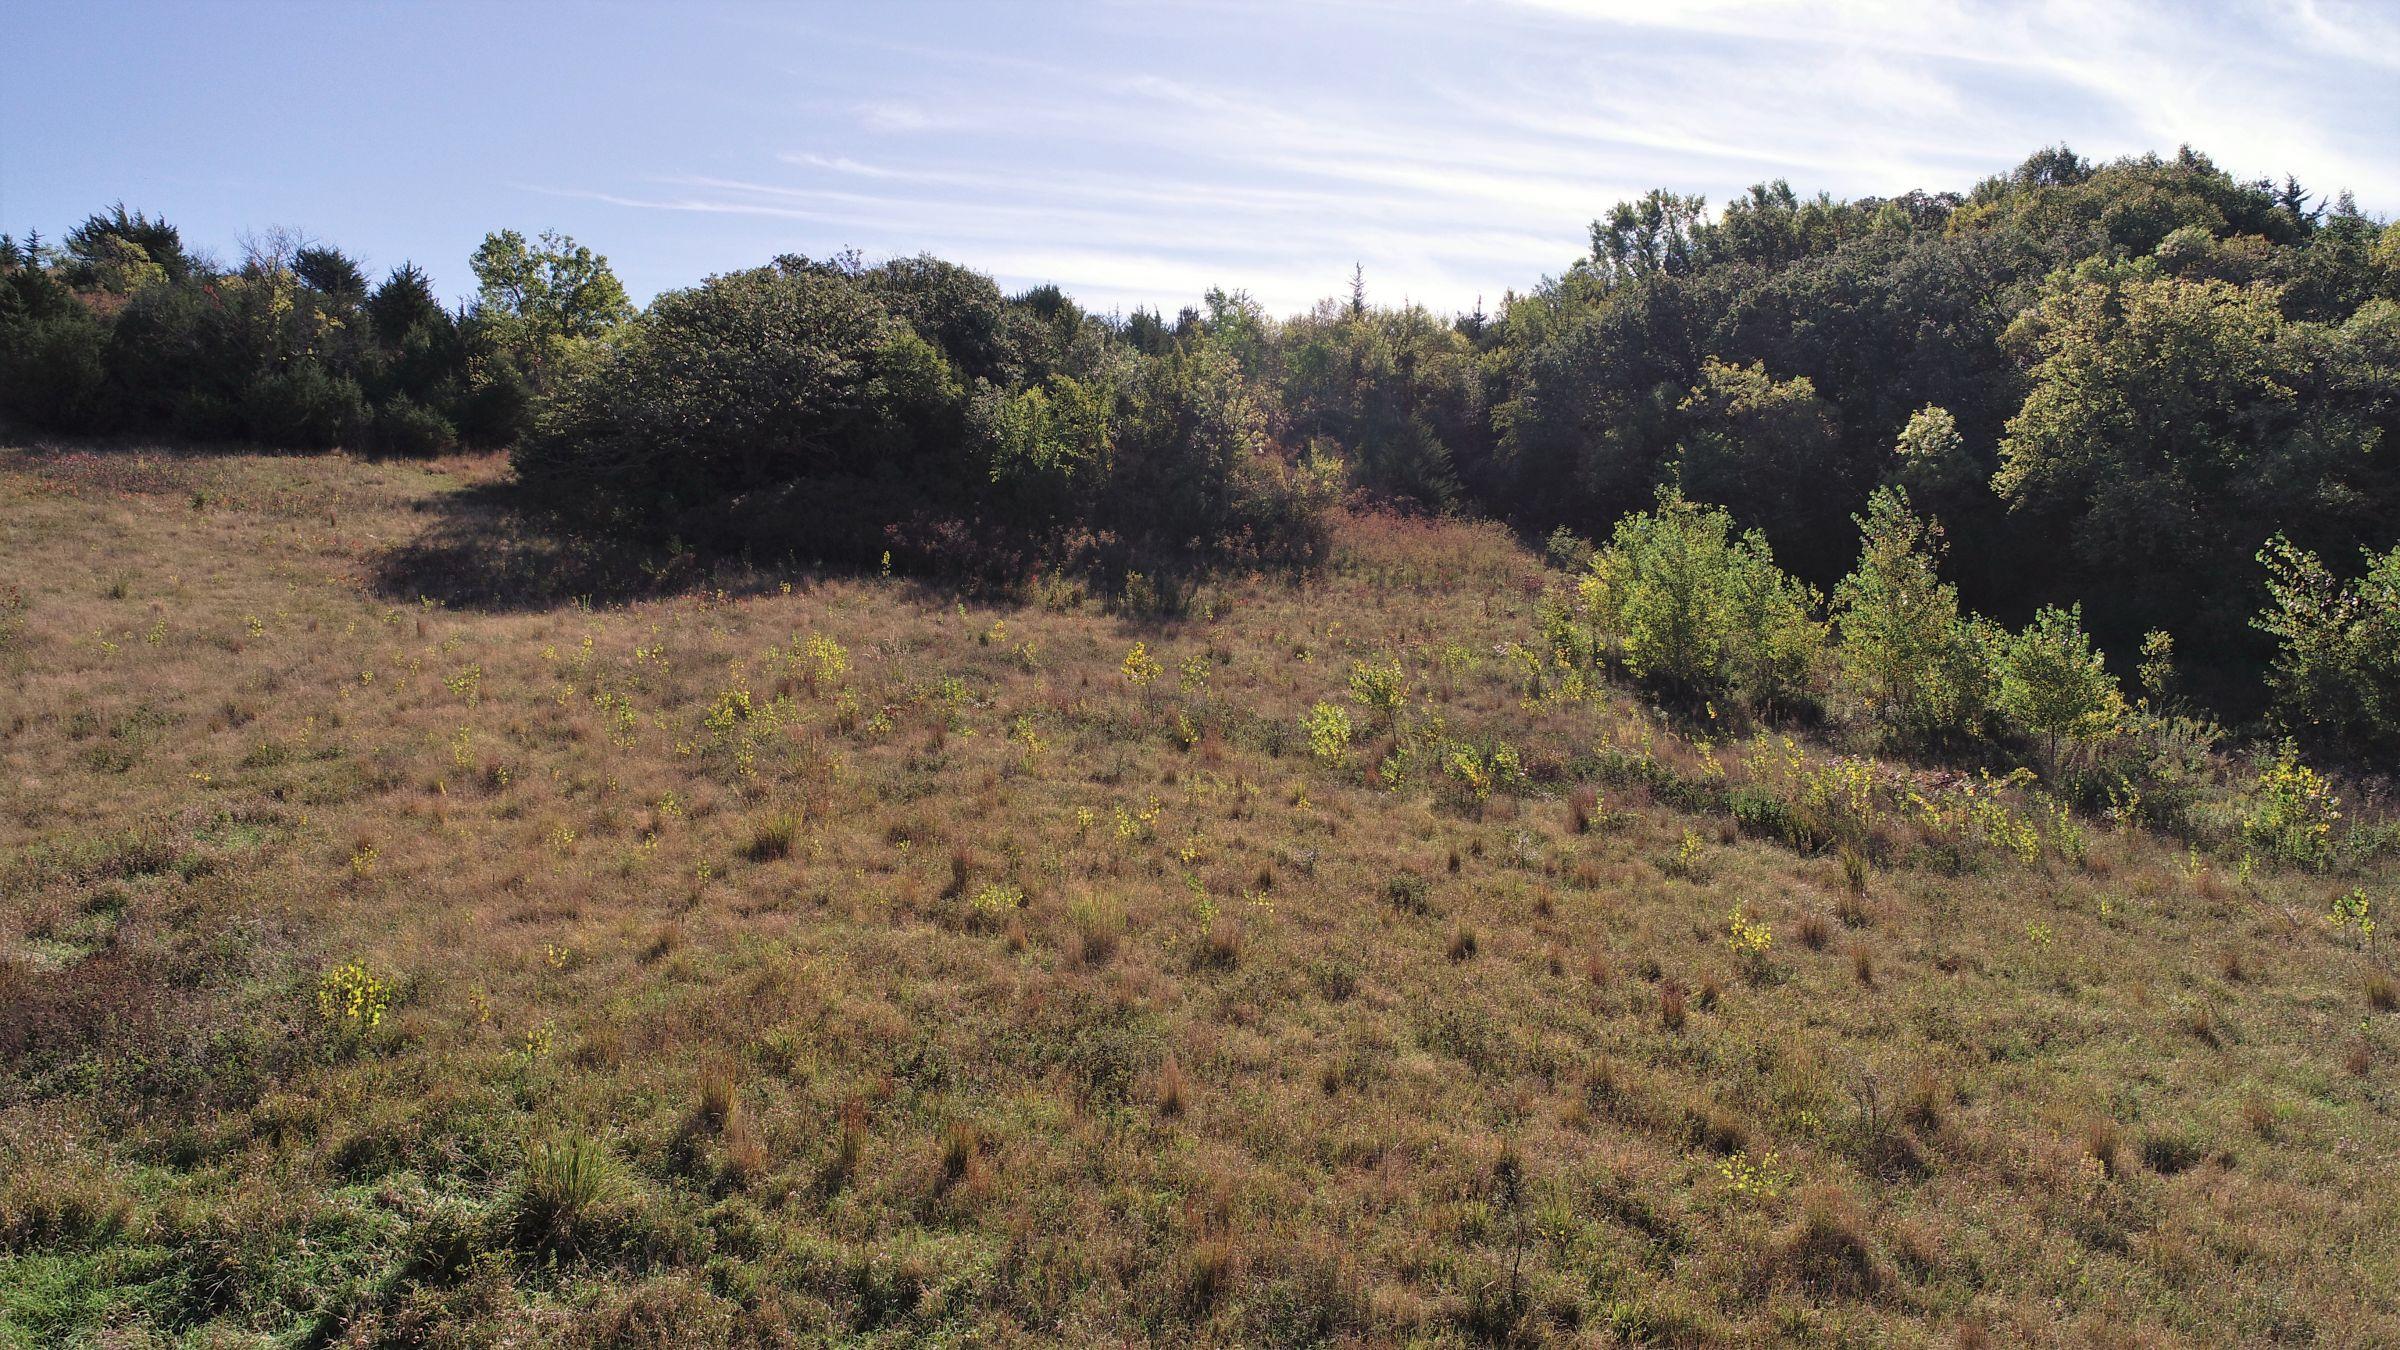 land-harrison-county-iowa-59-acres-listing-number-15527-0-2021-05-21-212721.JPG